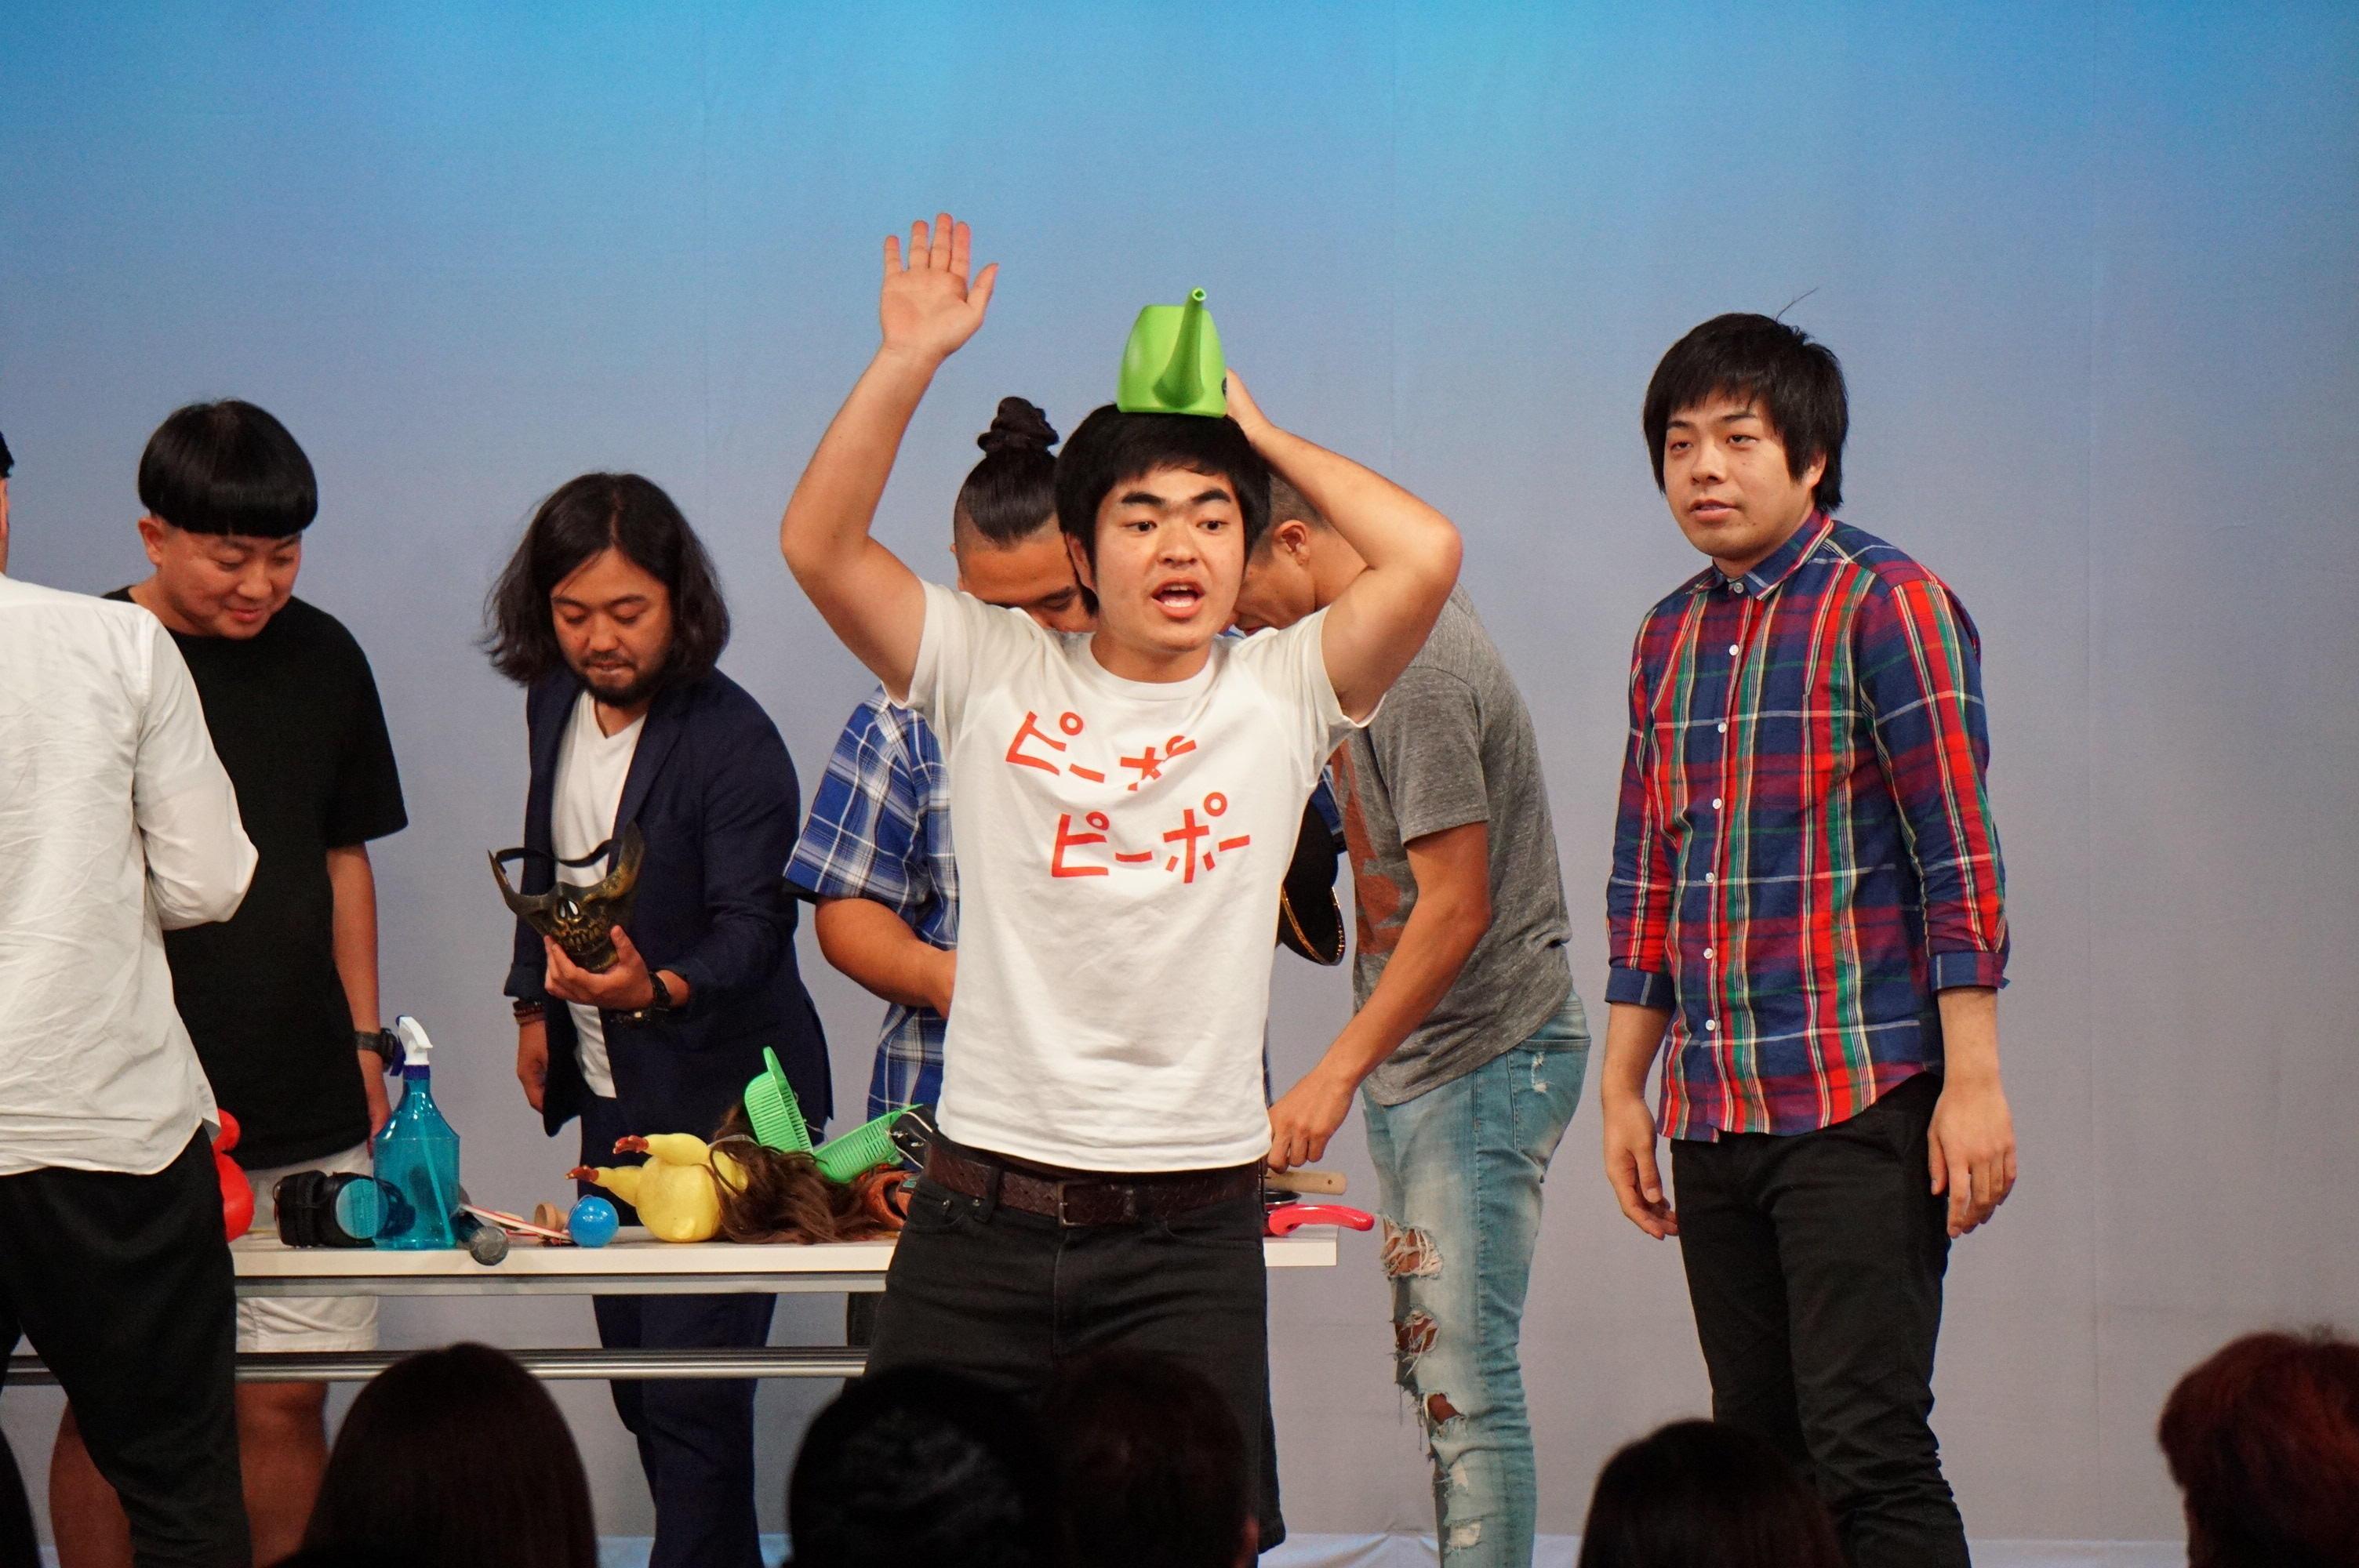 http://news.yoshimoto.co.jp/20160526180003-504ac9a2f76c8156061609ef2f134a9327ec81b9.jpg